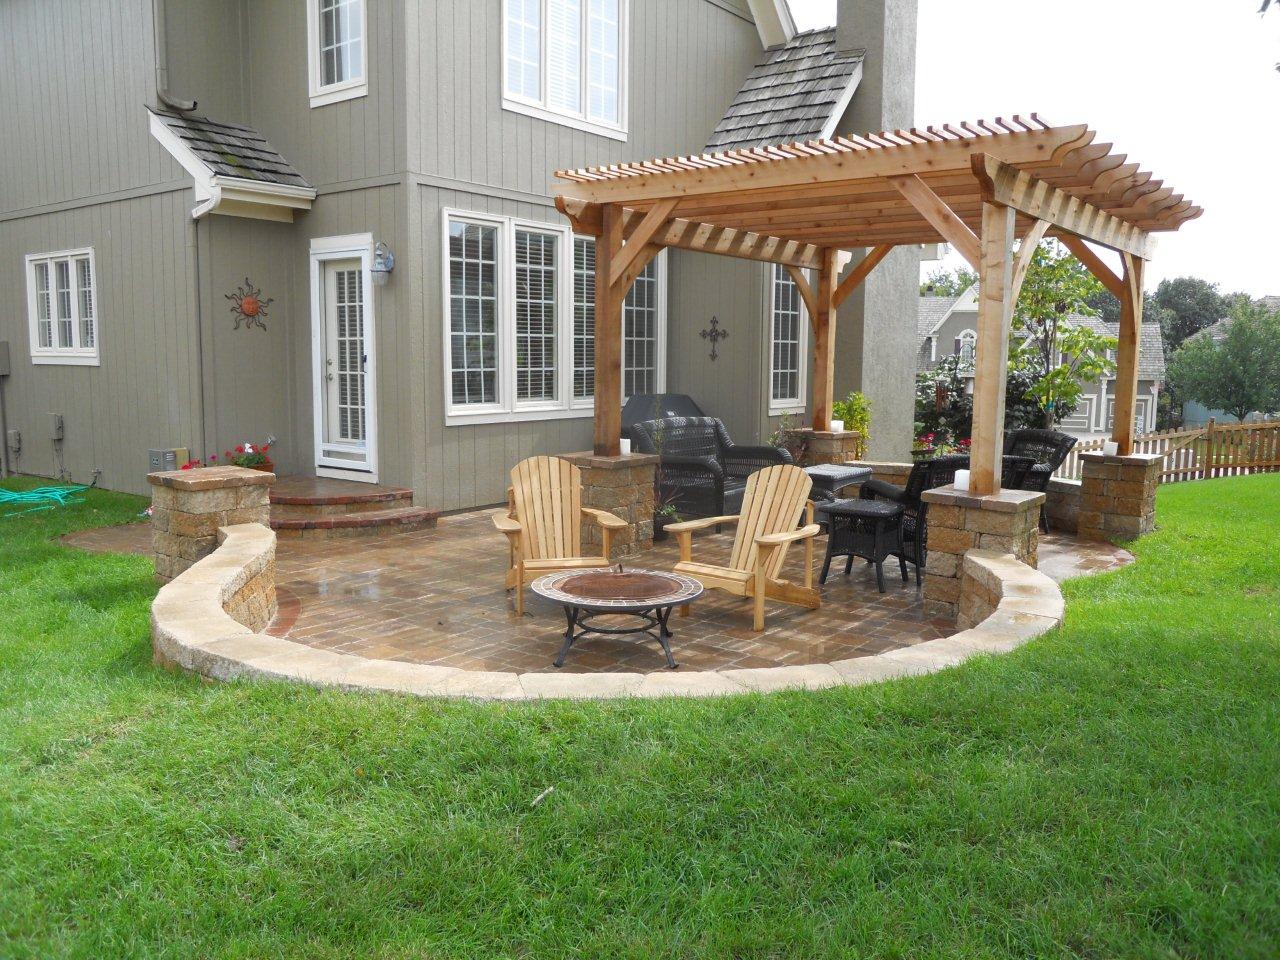 Paver patio hardscape | Archadeck of Kansas City on Hardscape Patio id=54206